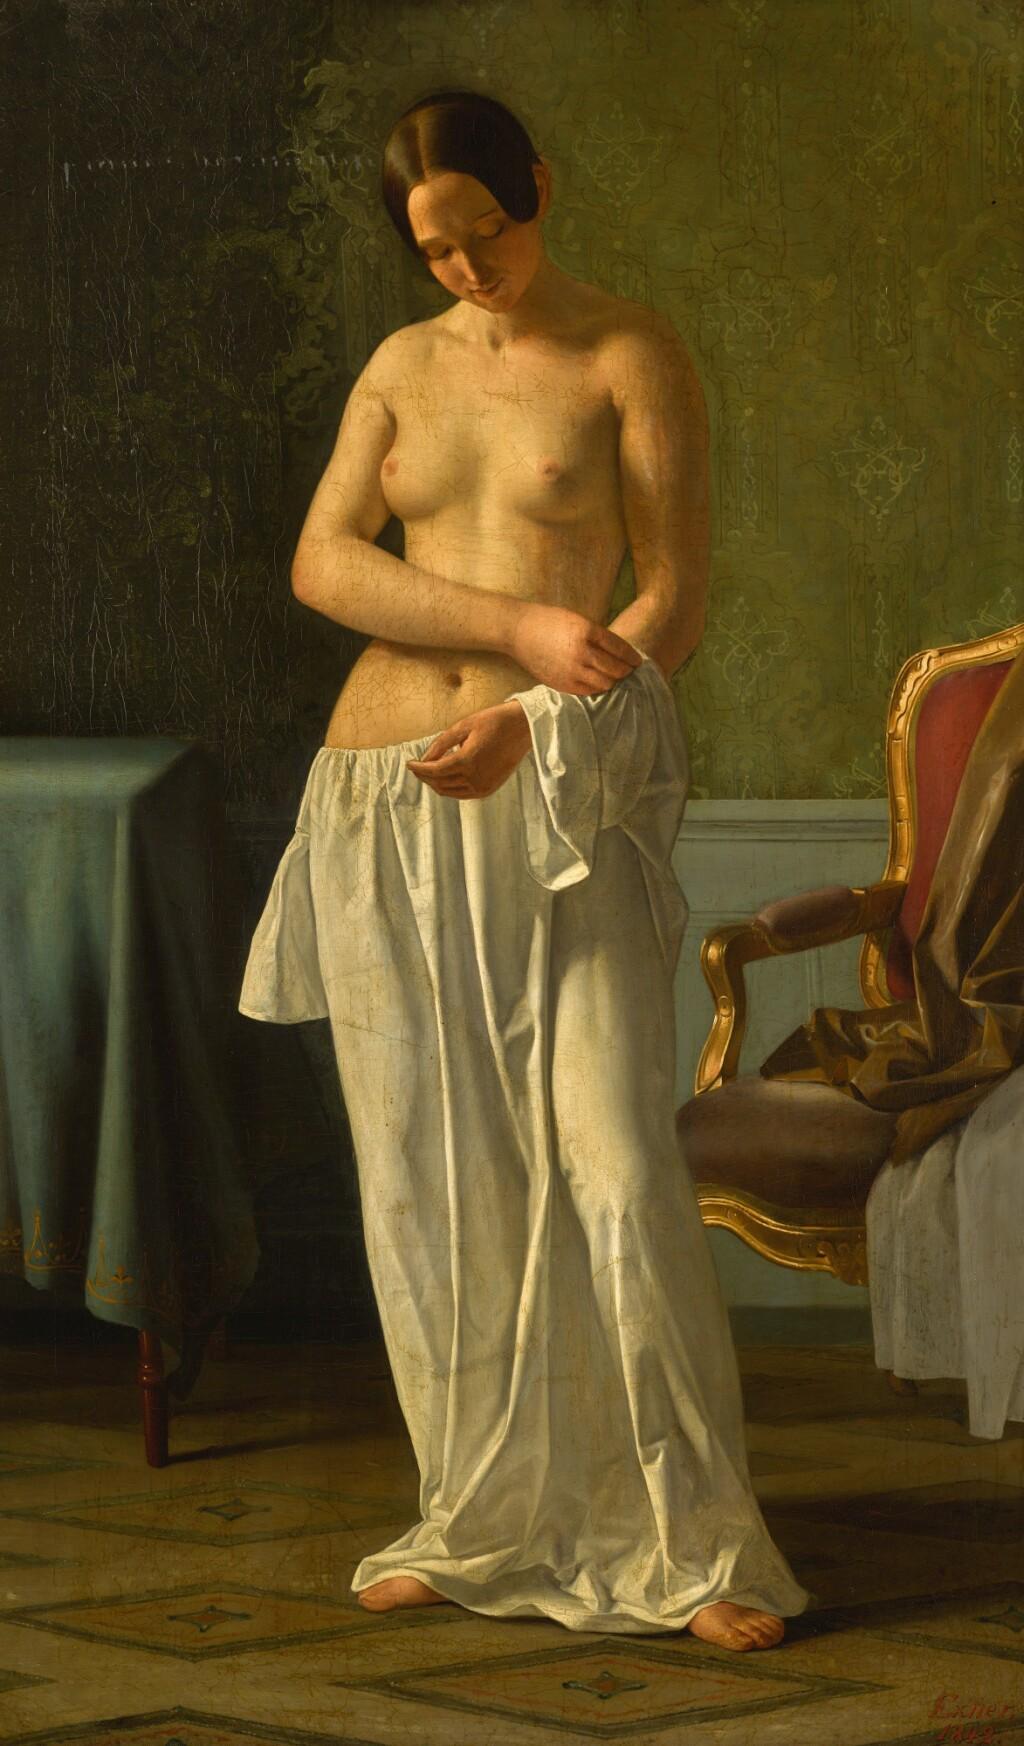 JOHAN JULIUS EXNER | The Artist's Model